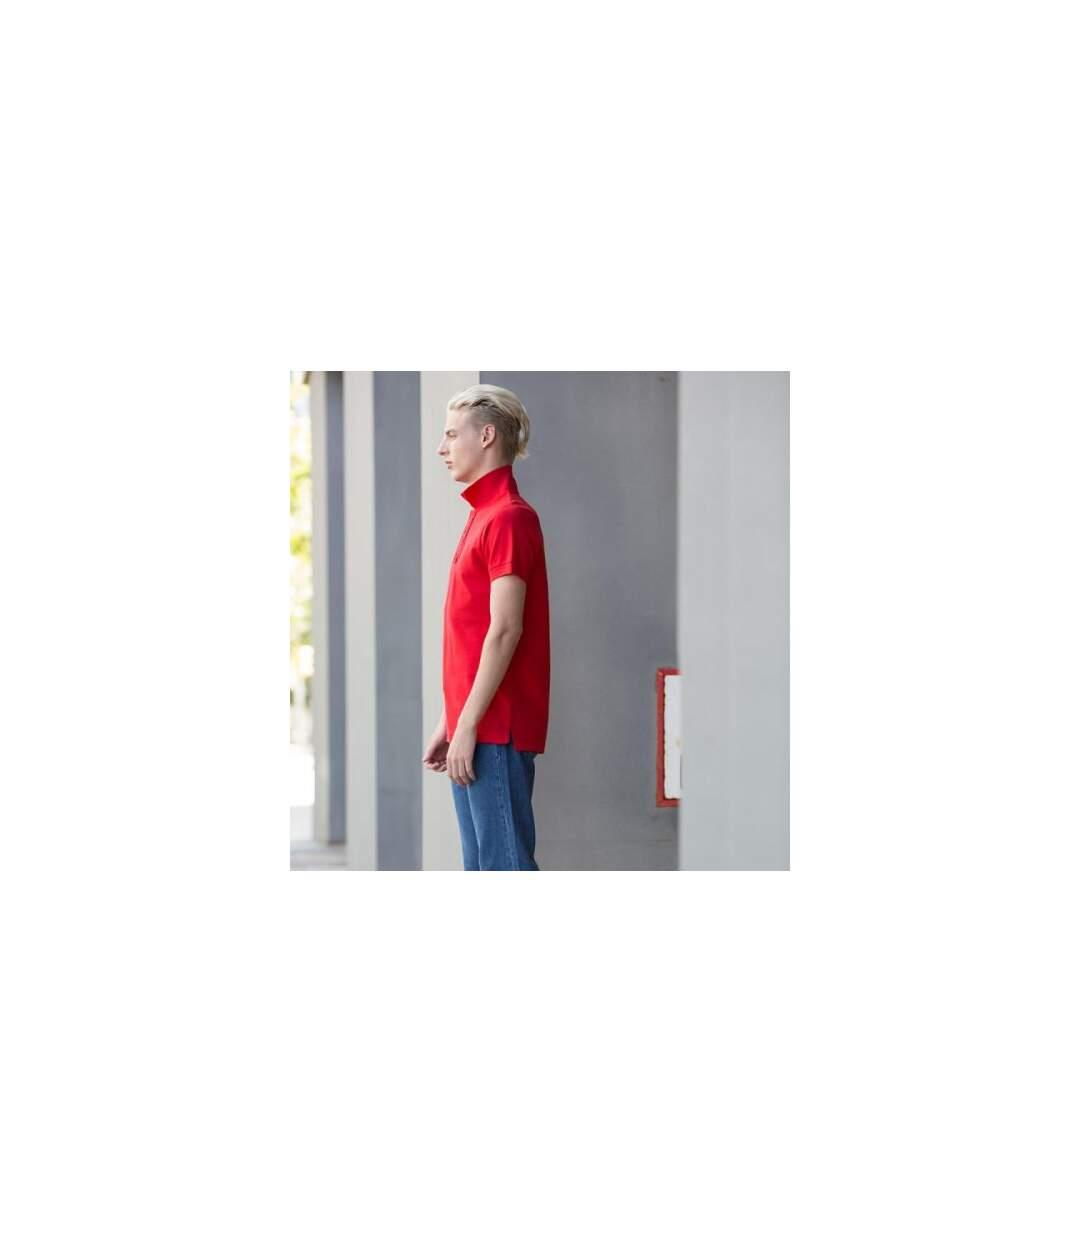 Skinni Fit - Polo À Manches Courtes - Homme (Rouge vif) - UTRW1400